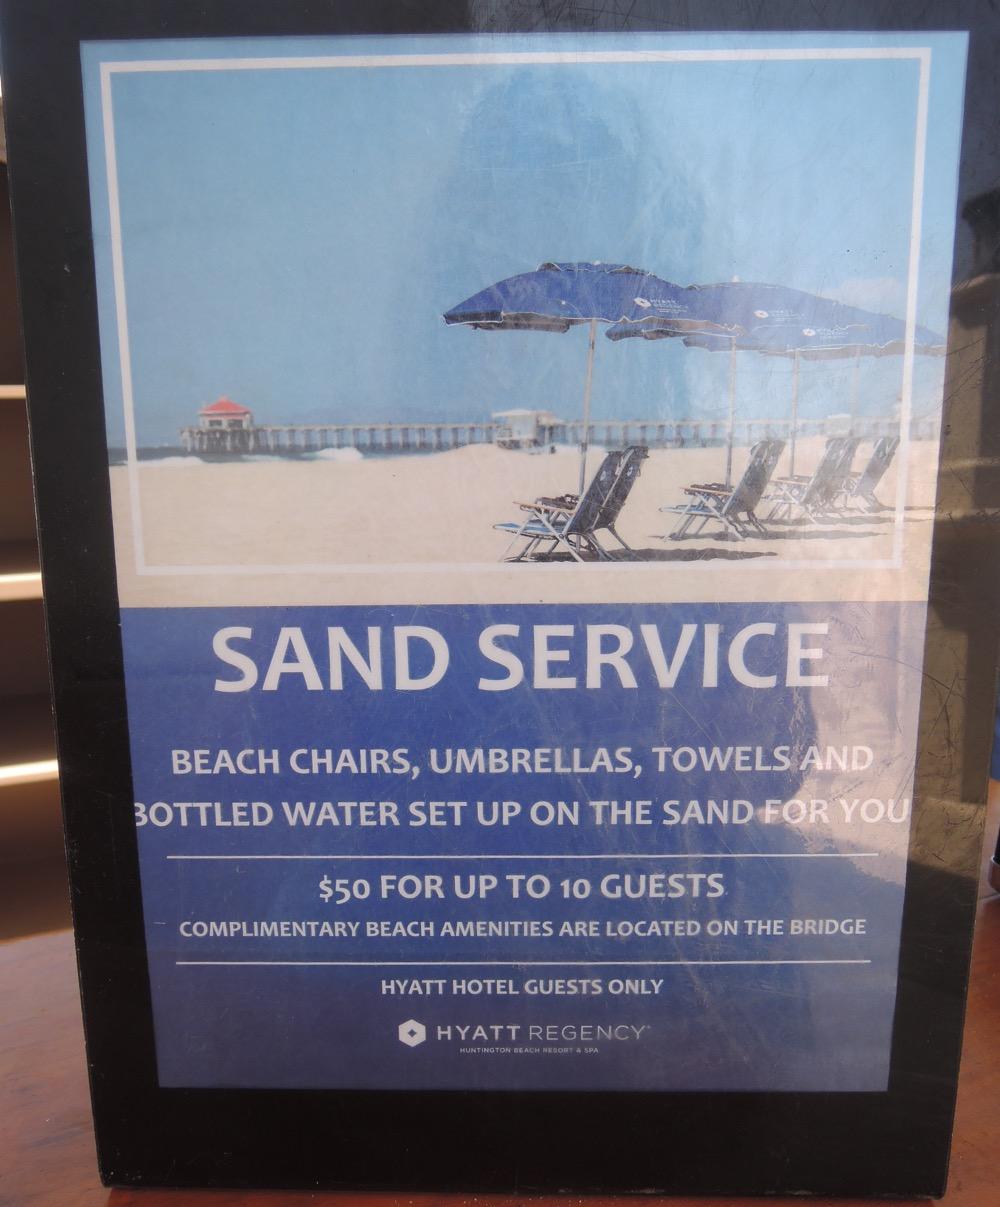 Hyatt-Regency-Huntington-Beach-Review-59